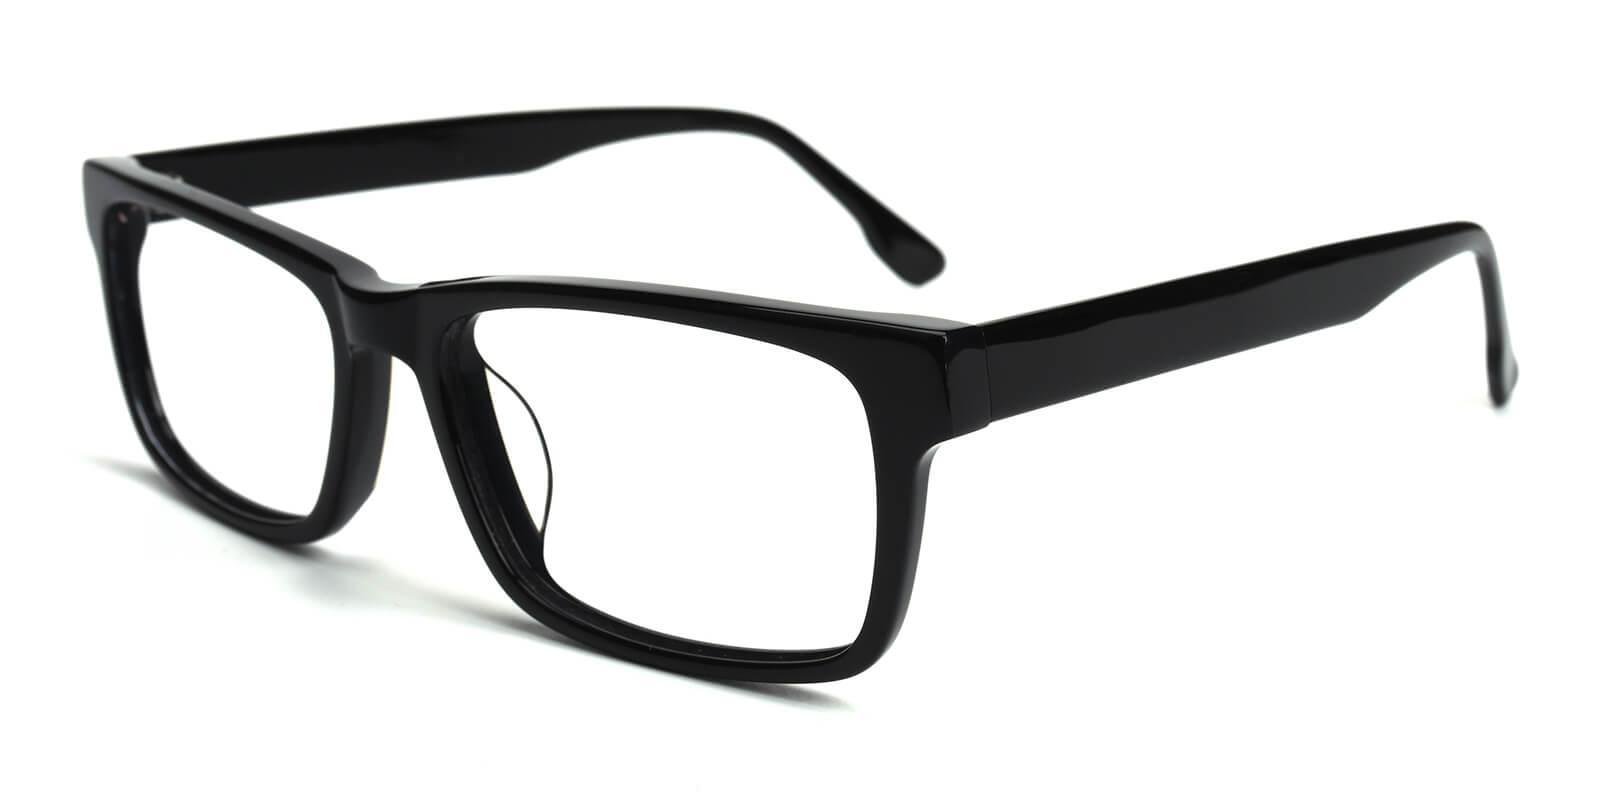 Obsidian-Black-Rectangle-Acetate-Eyeglasses-additional1